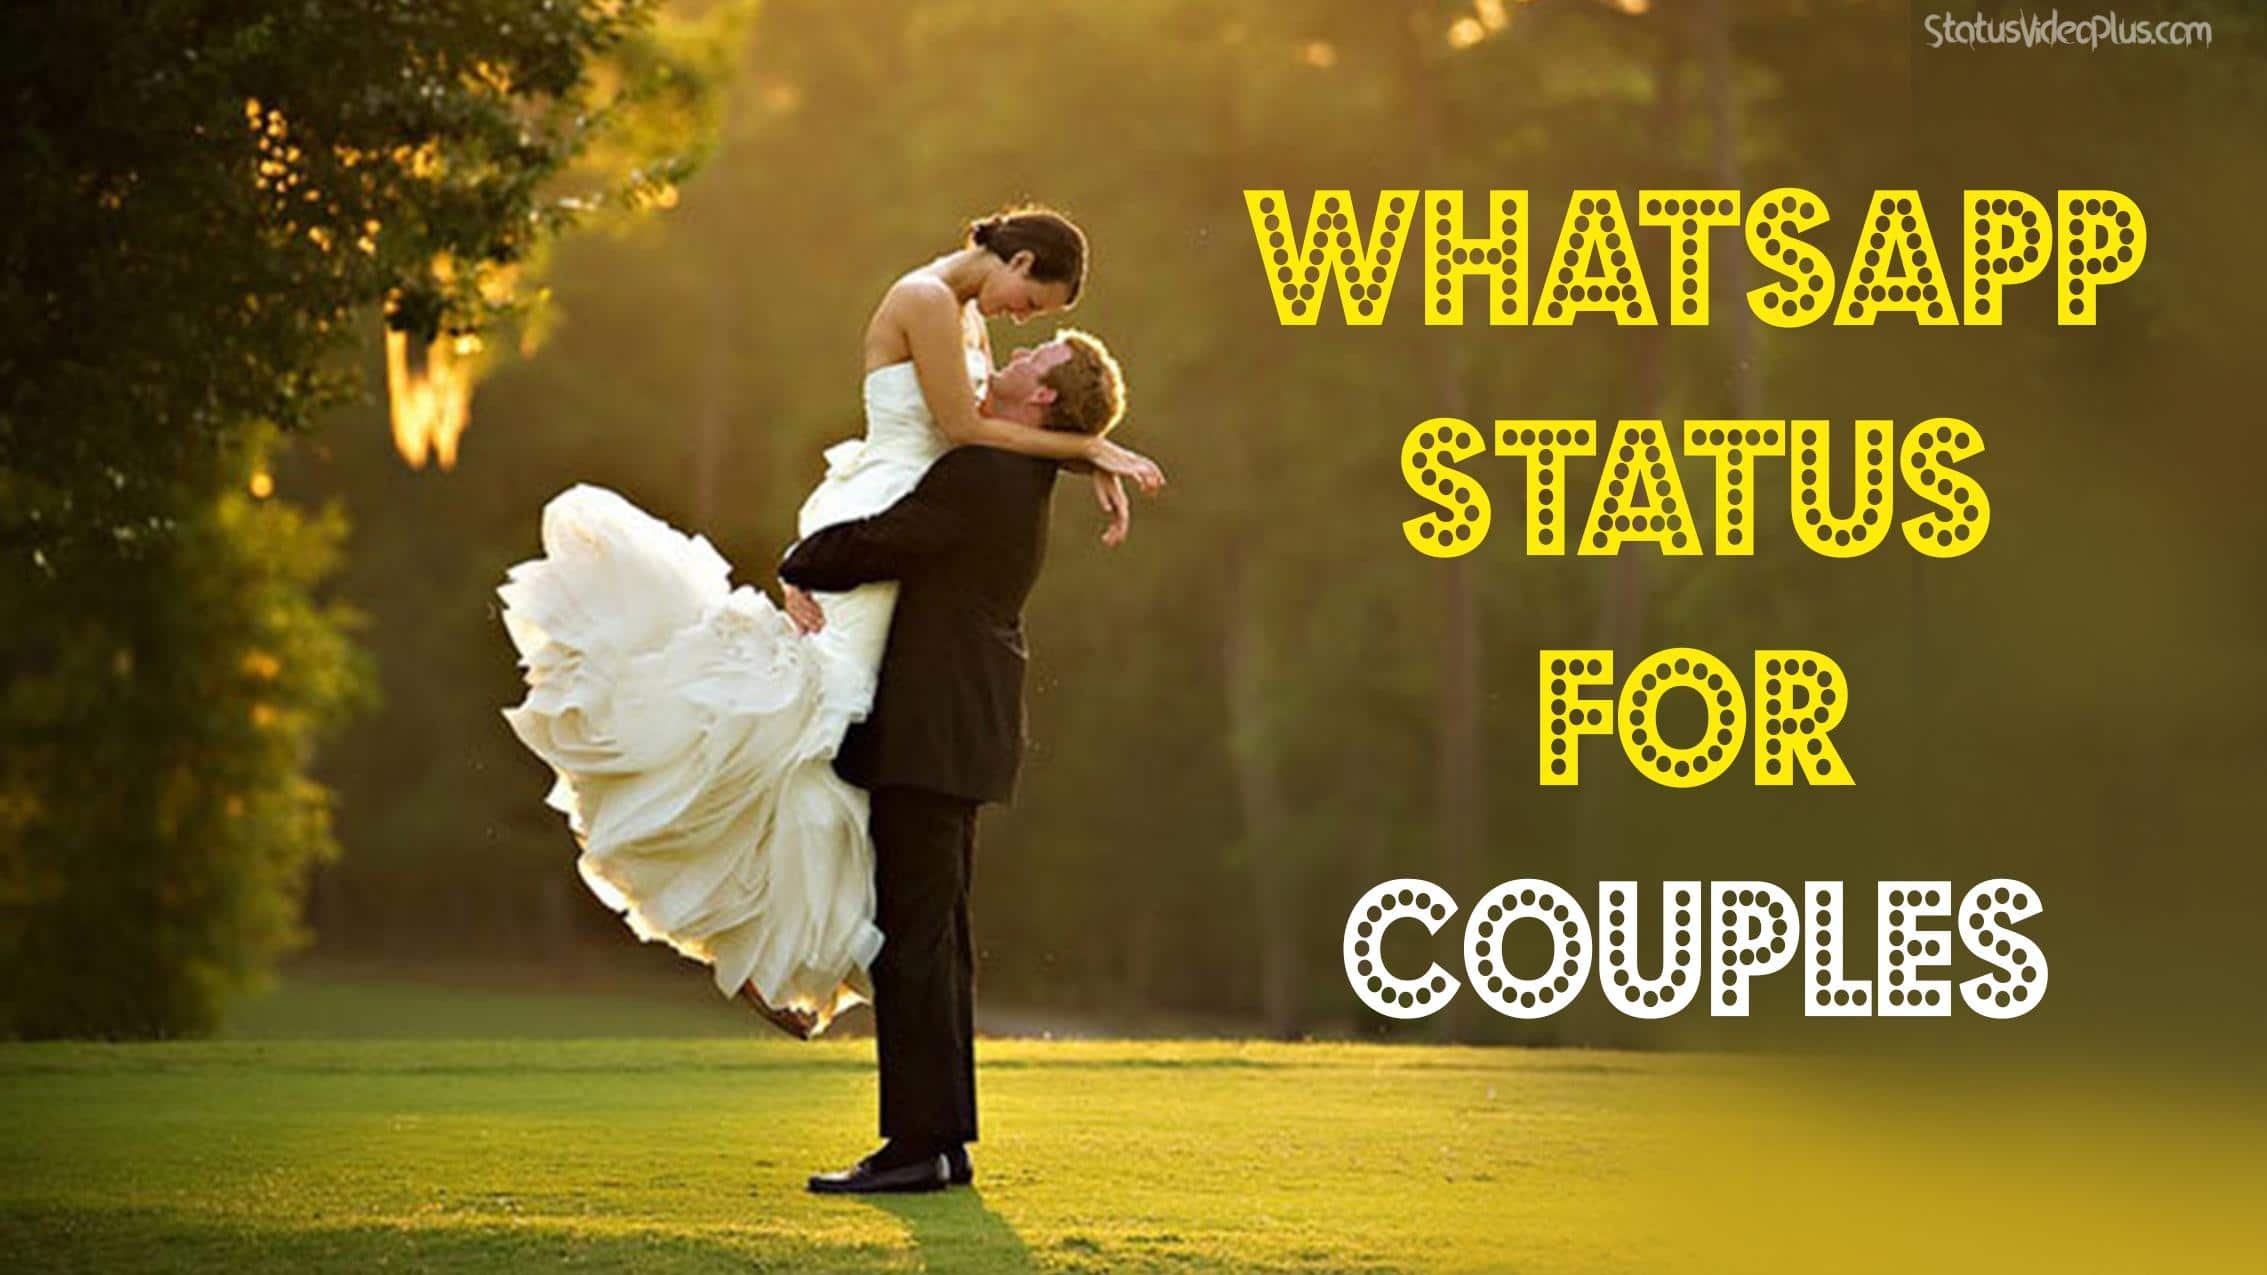 romantic love couple cute whatsapp status video download